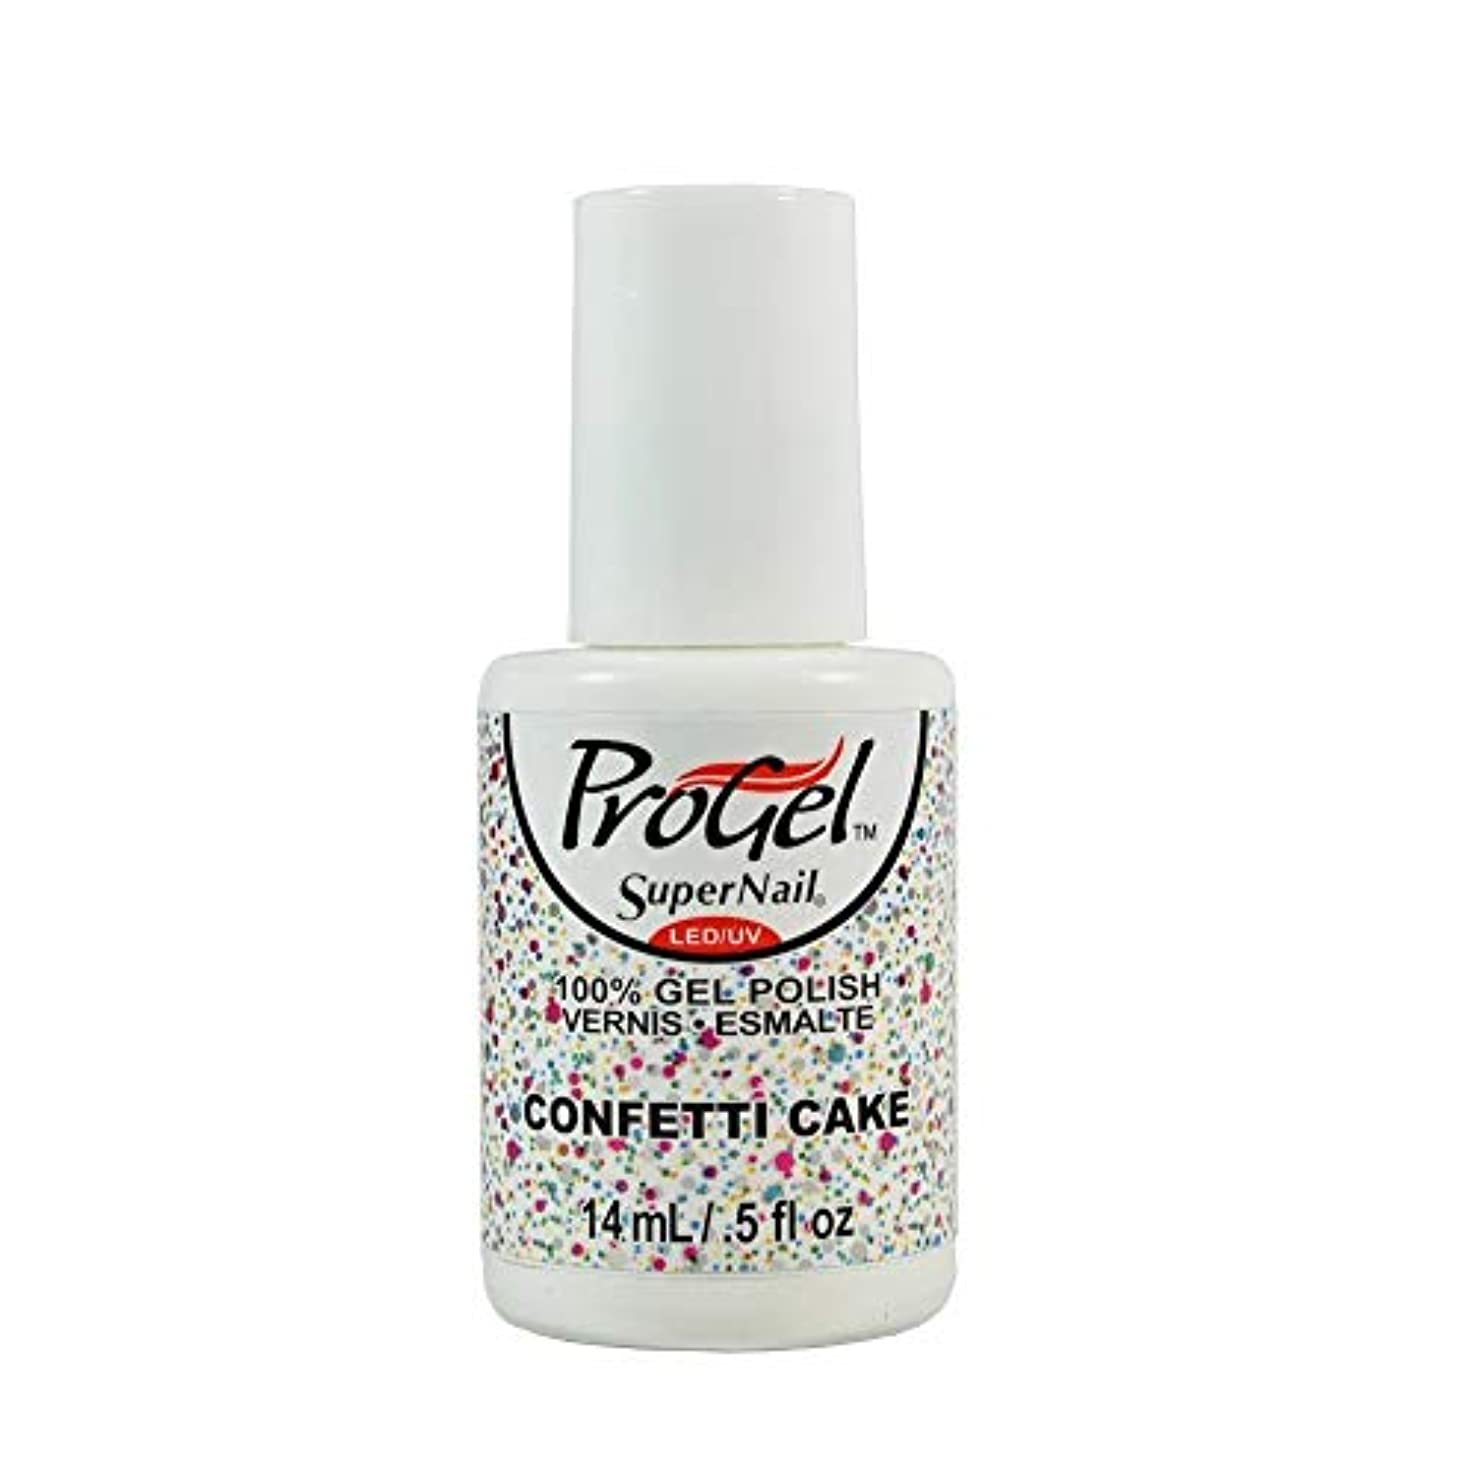 時期尚早統治可能高さSuperNail ProGel Gel Polish - Confetti Cake - 0.5oz / 14ml